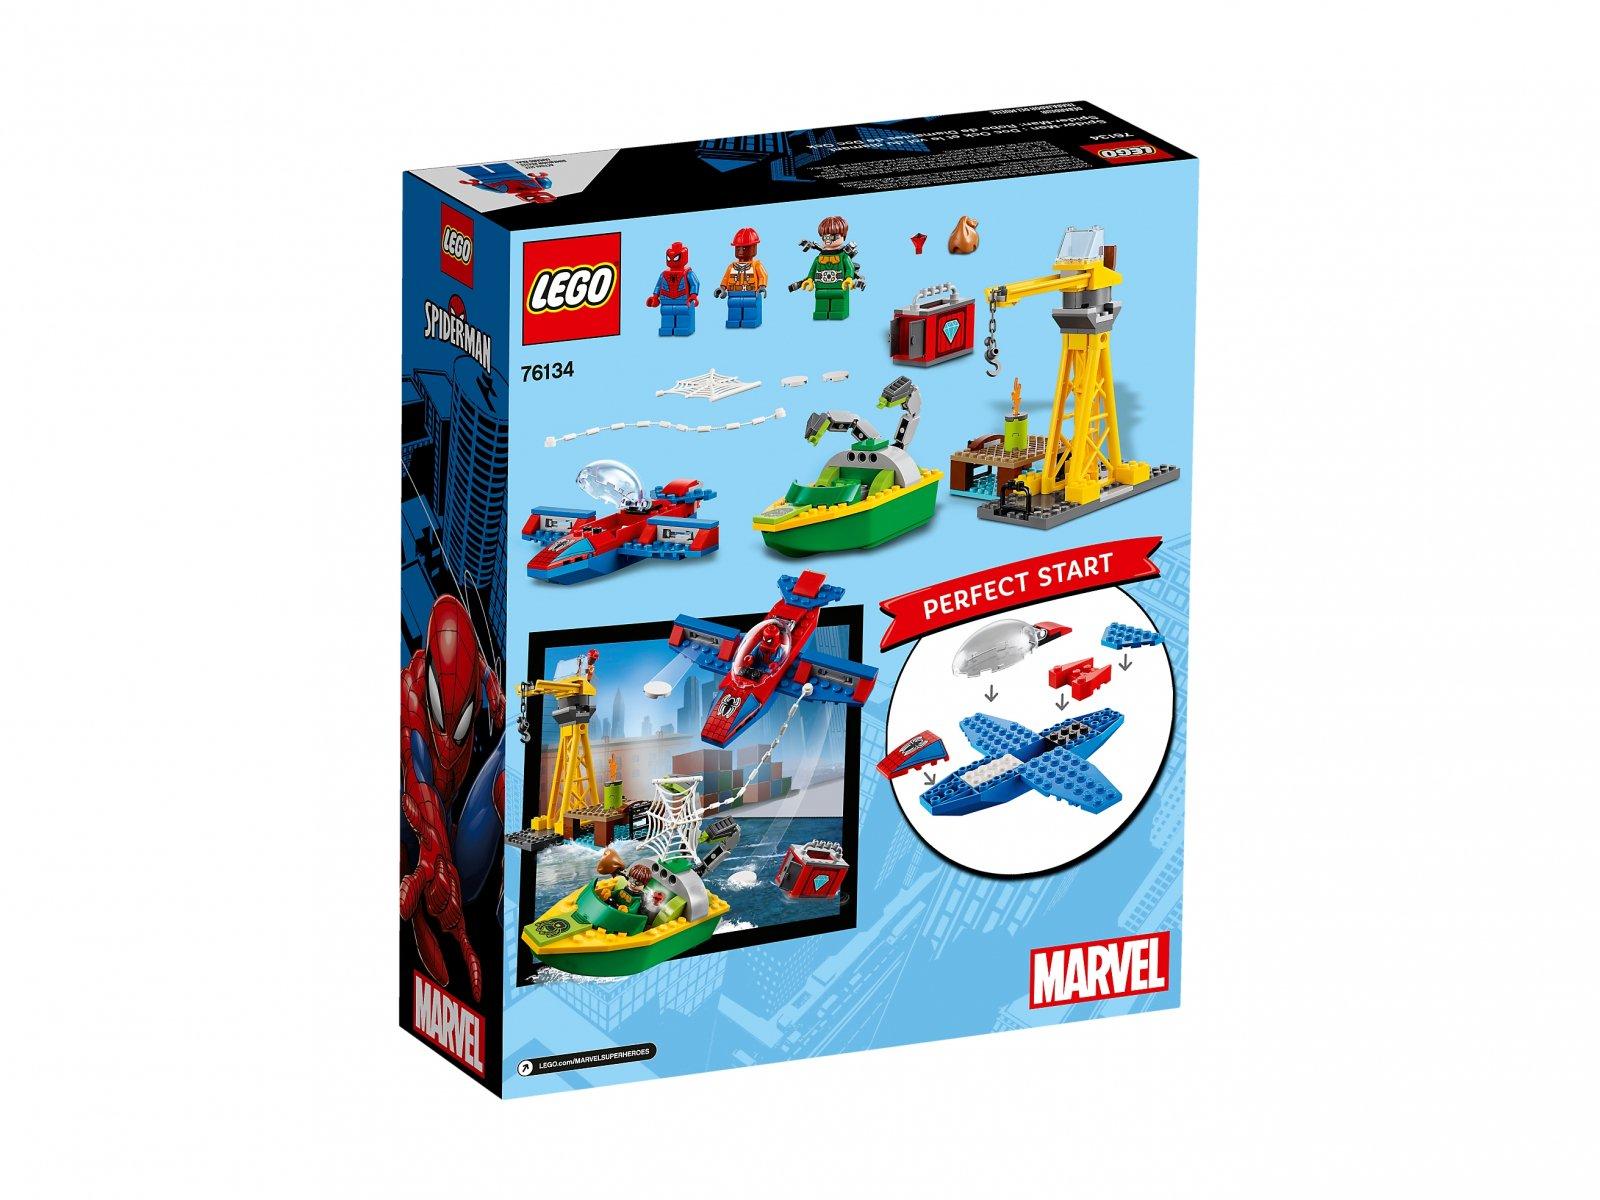 LEGO Marvel Super Heroes 76134 Doktor Octopus - skok na diamenty